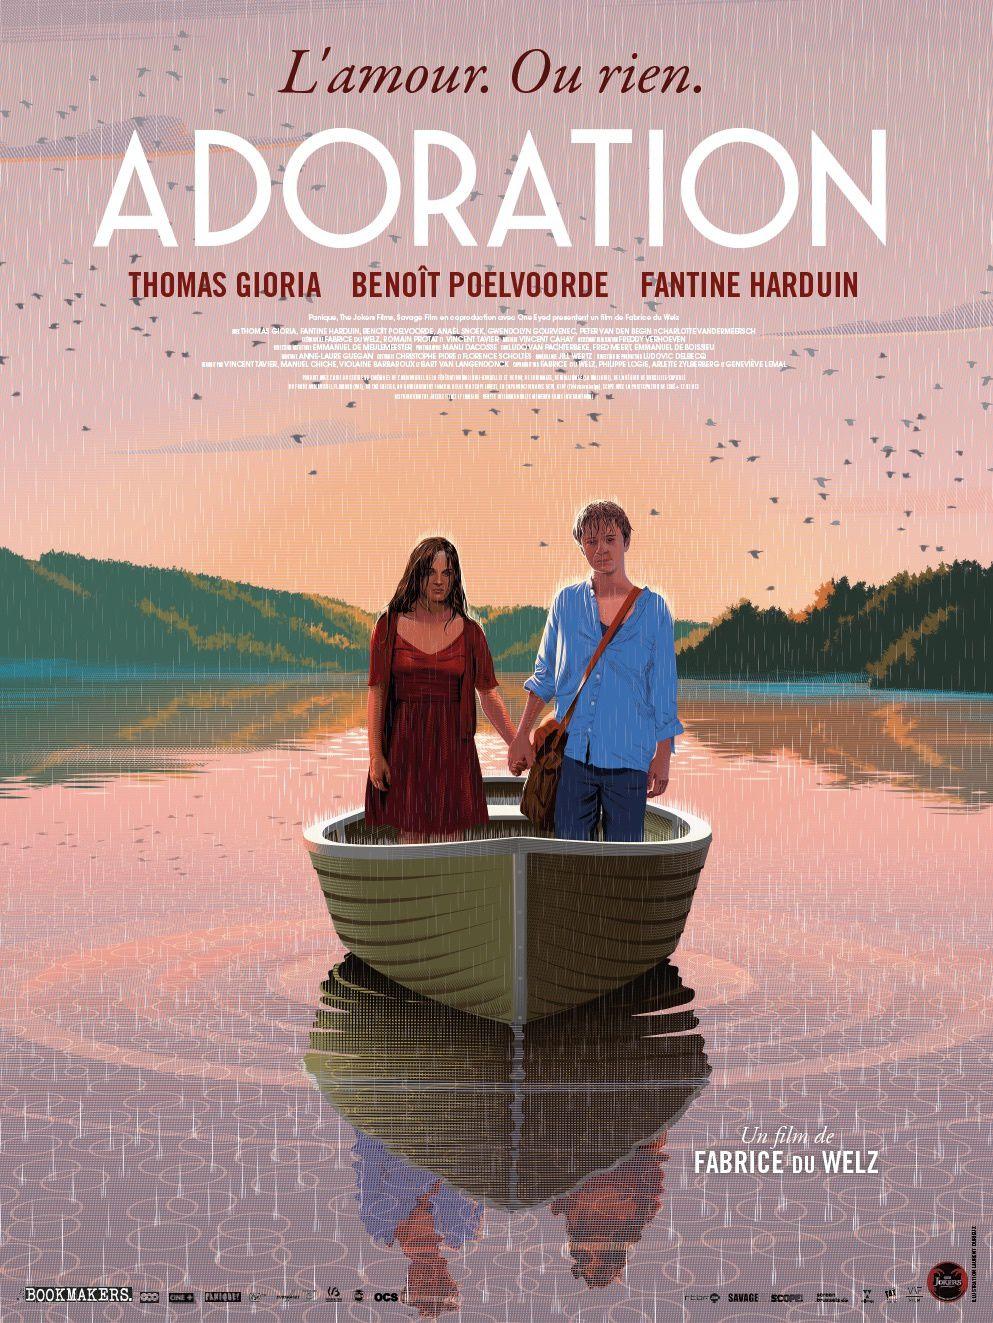 Bande-annonce d'Adoration, film avec Thomas Gioria, Fantine Harduin et Benoît Poelvoorde.